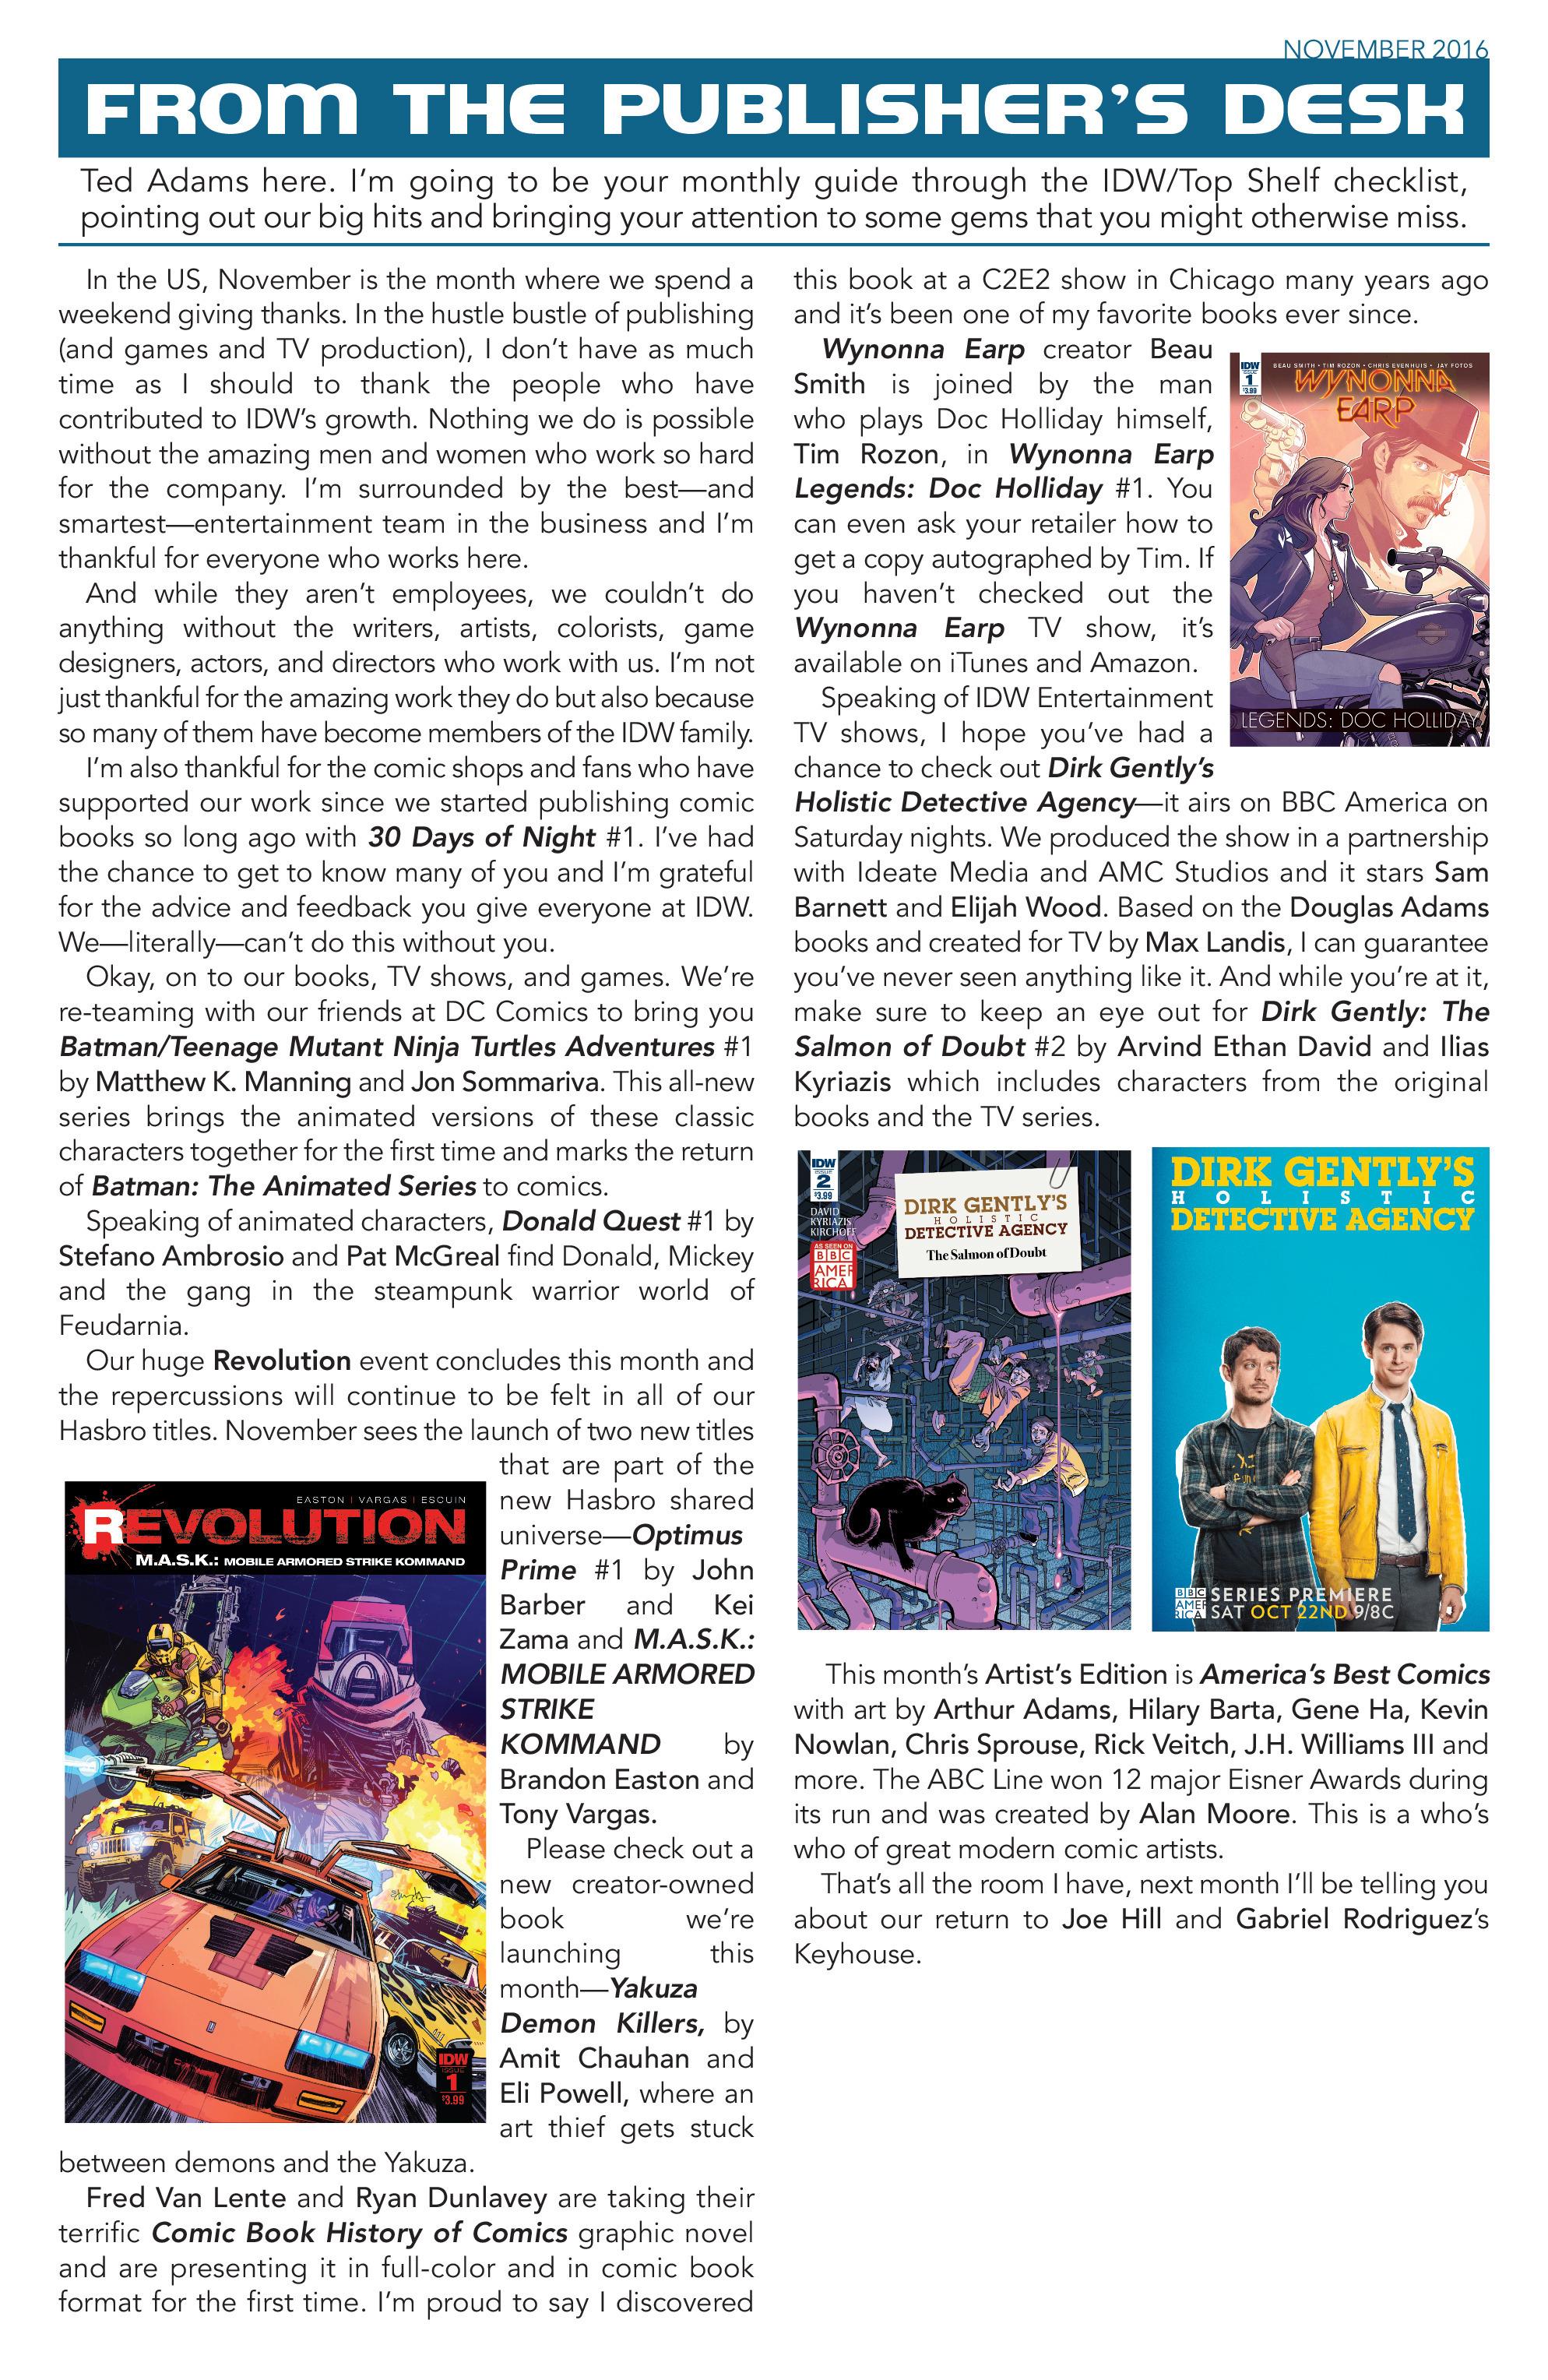 G.I. Joe: A Real American Hero 234 Page 24